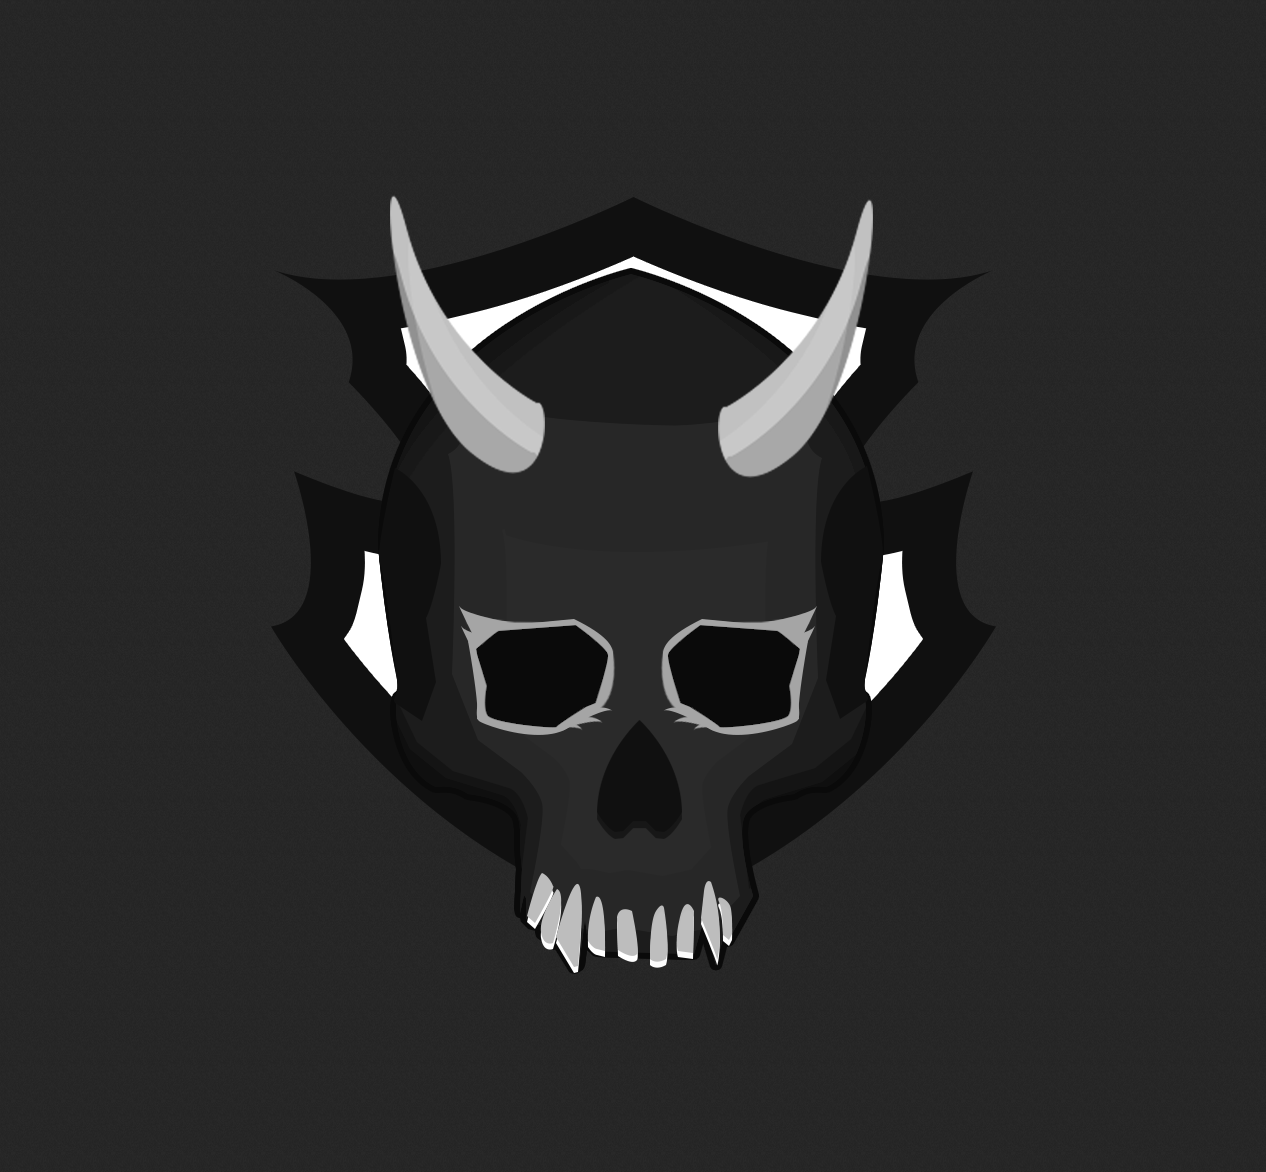 polish devils csgo clan logo by draxu on deviantart